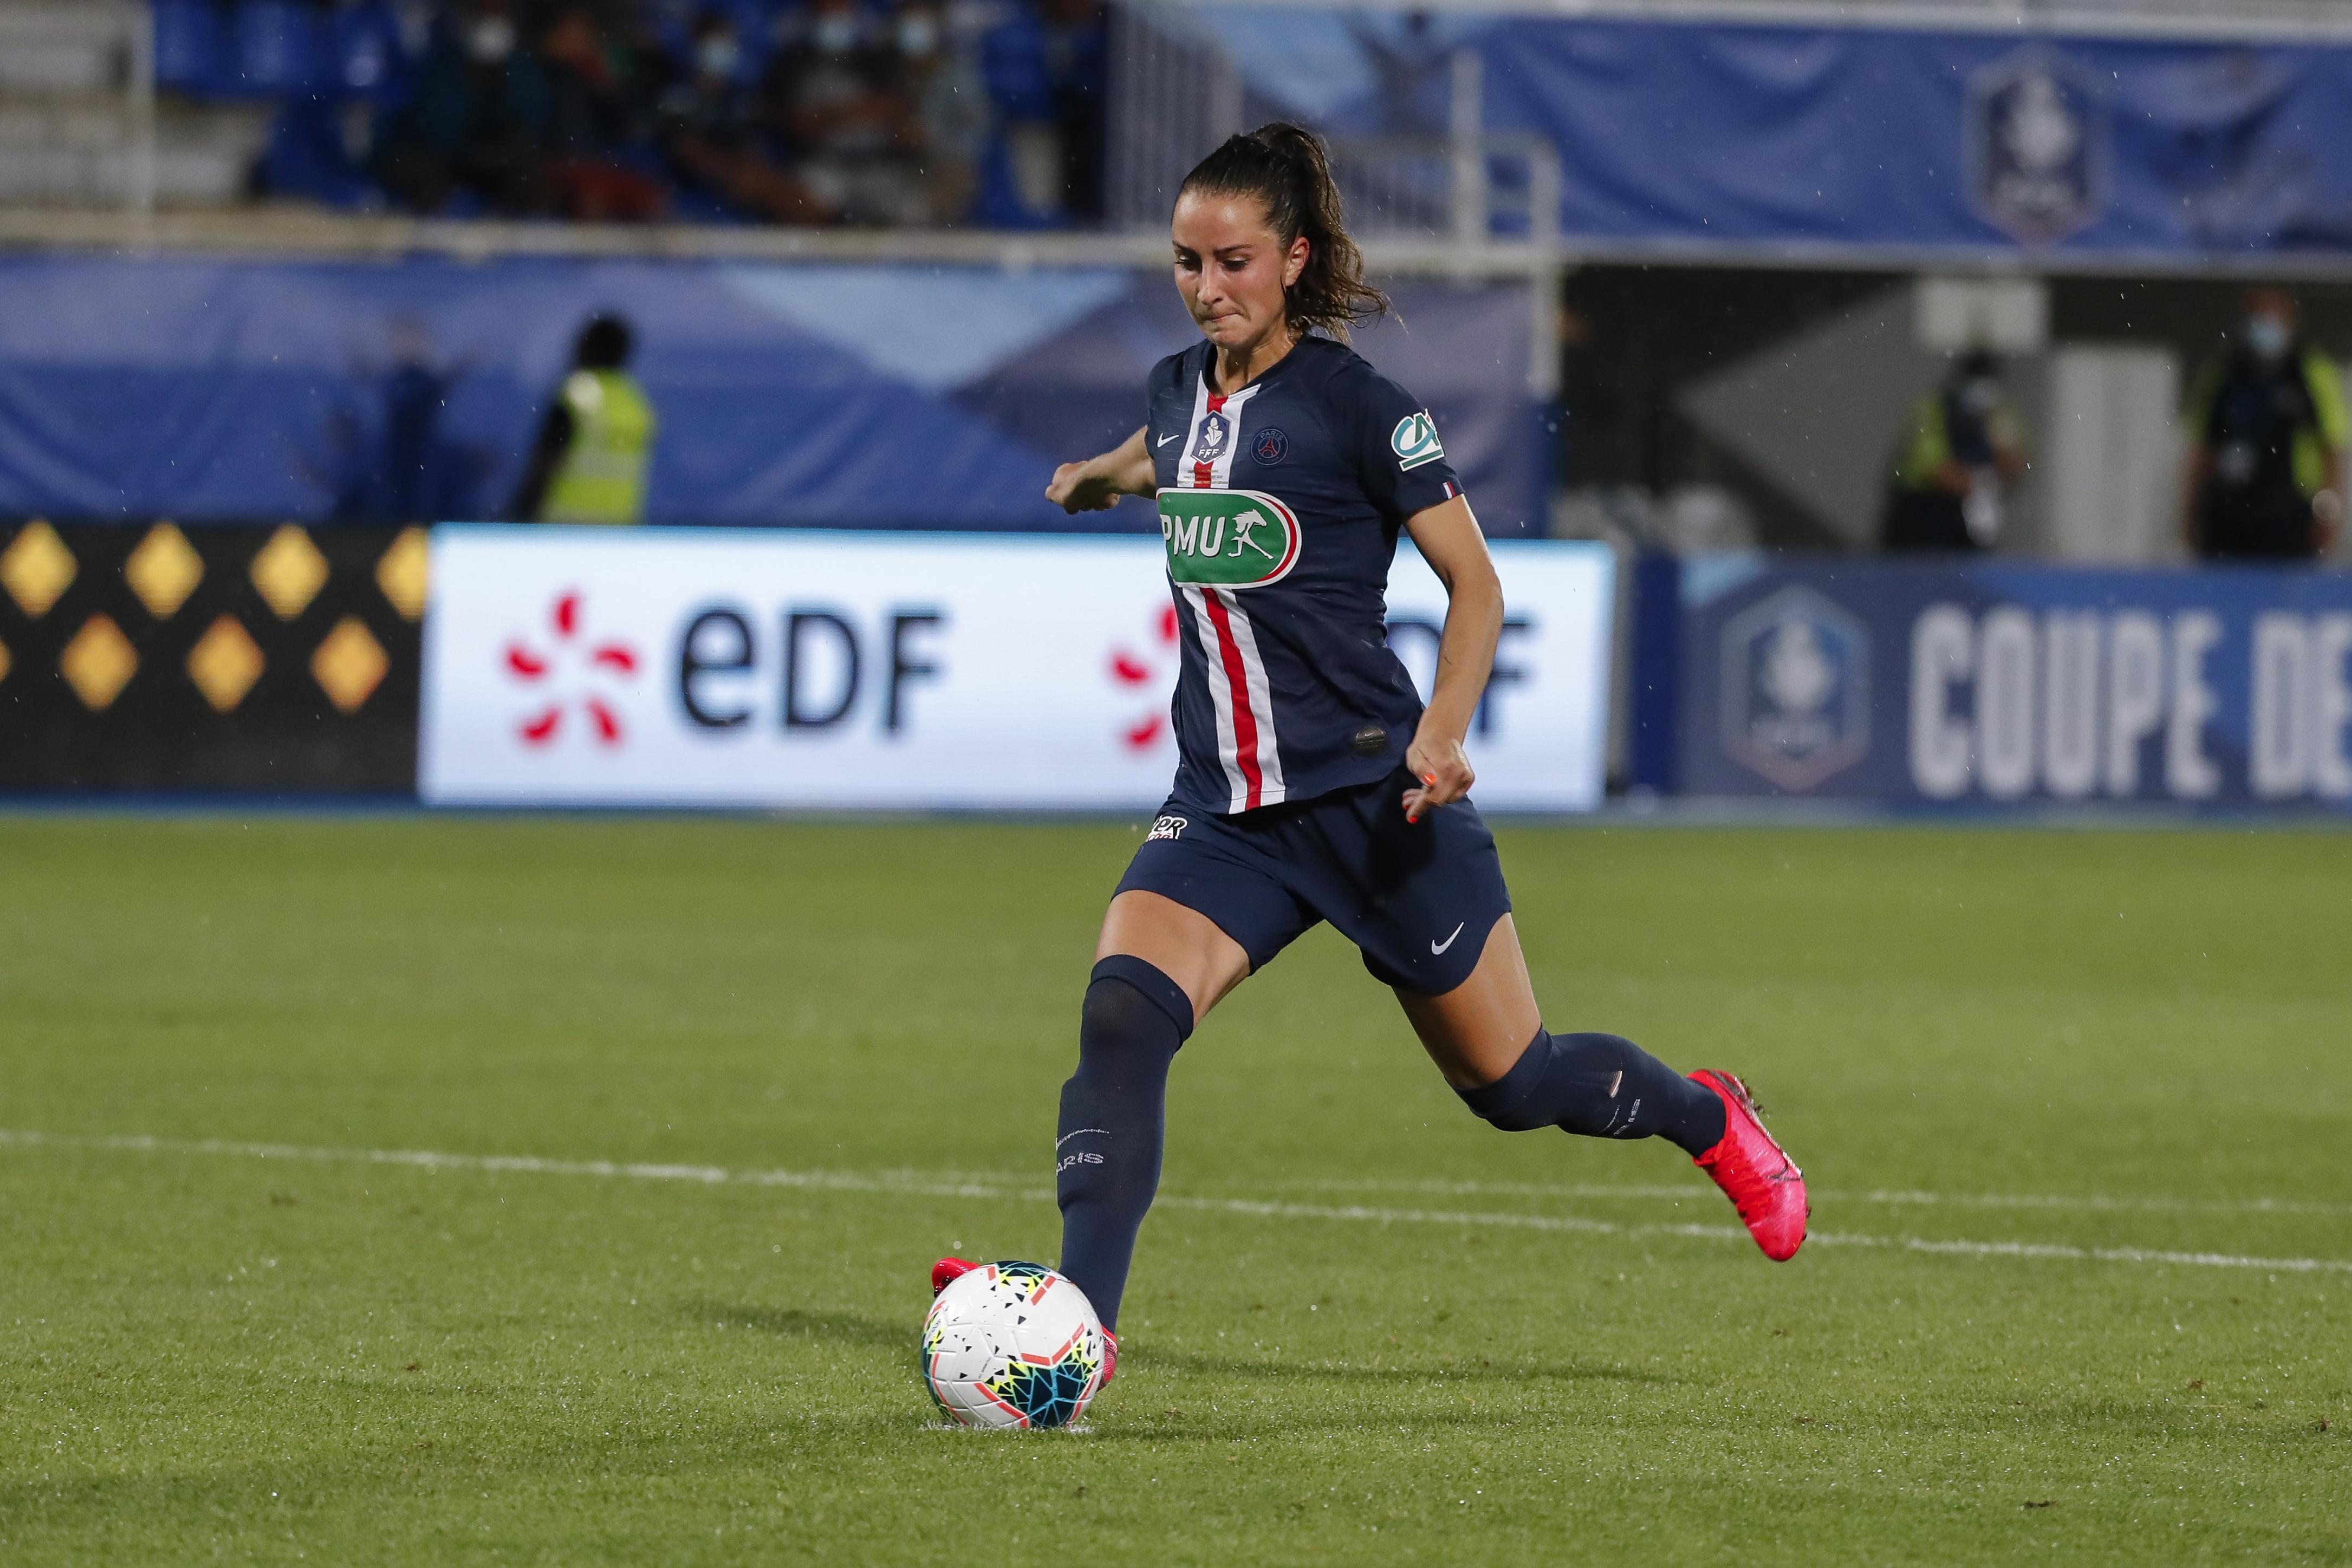 Paris Saint-Germain v Olympique Lyonnais - Women's French Cup Final